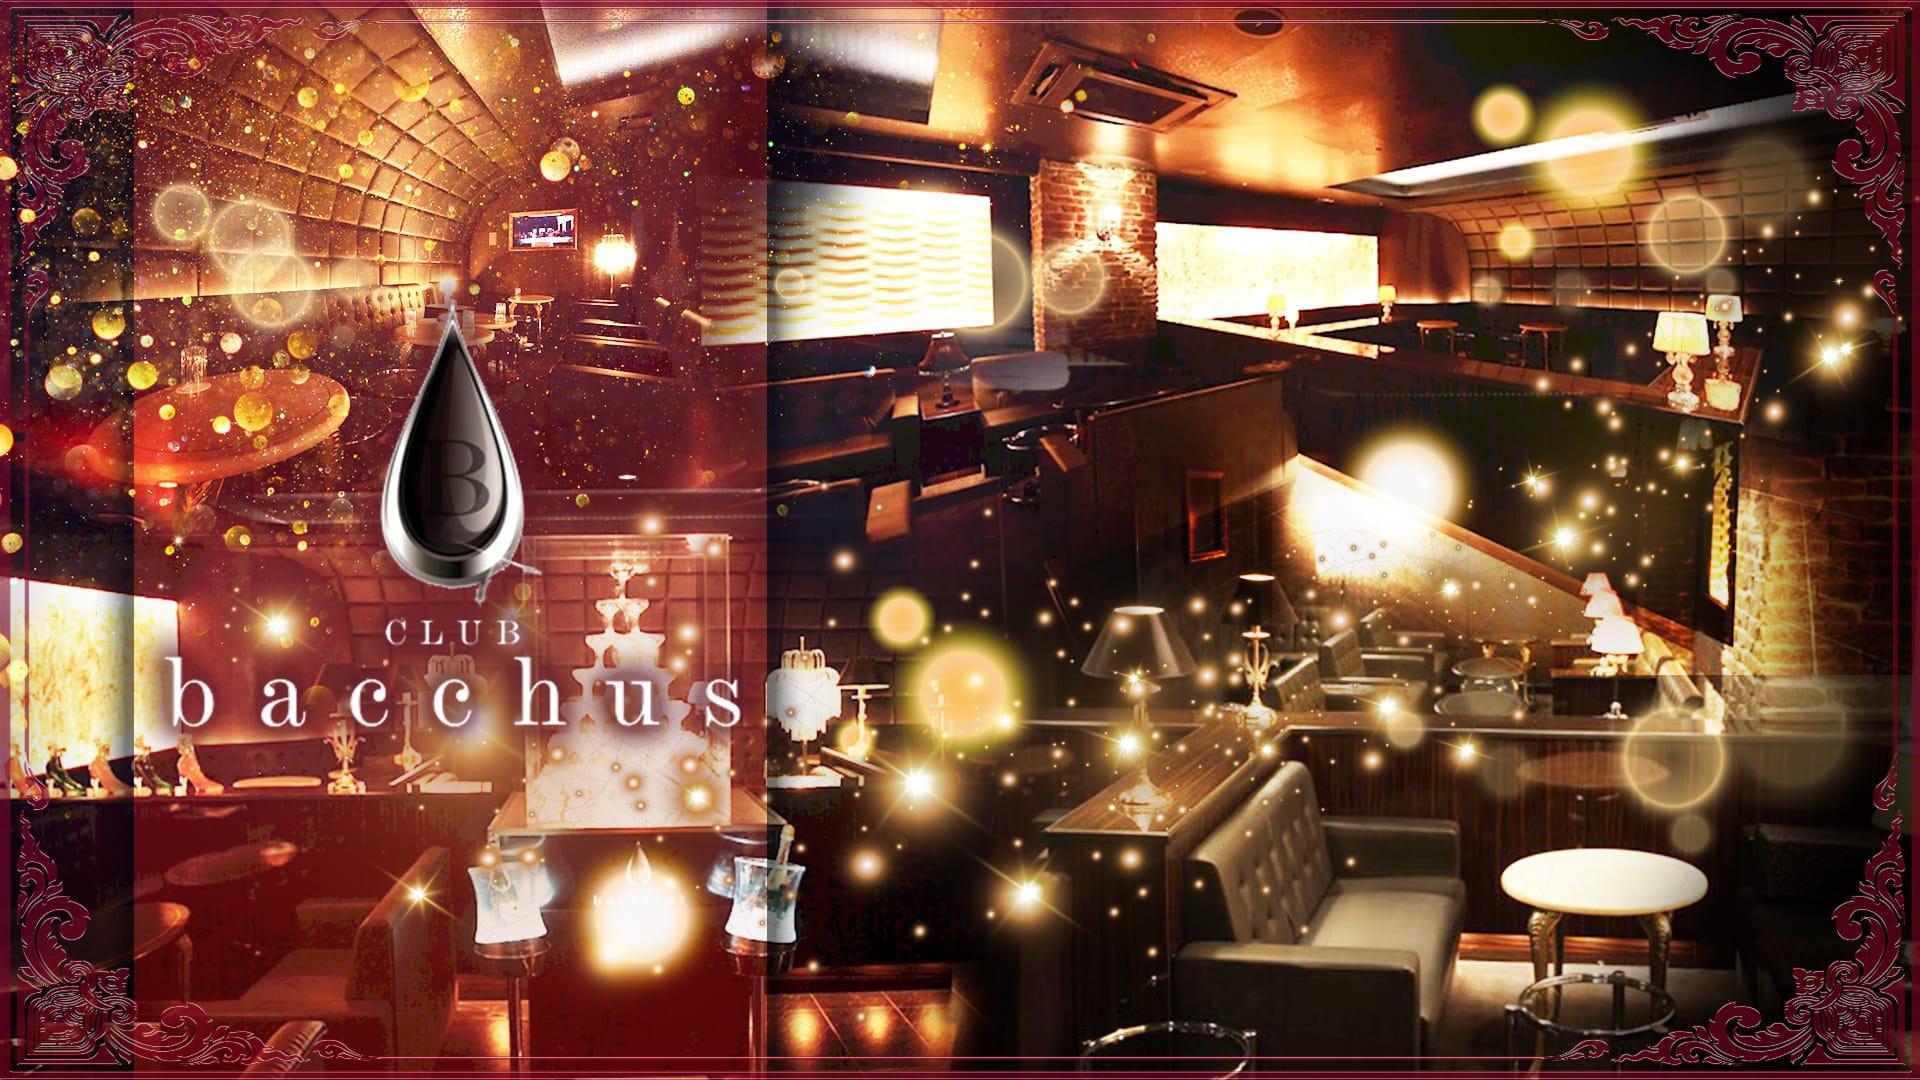 CLUB bacchus (クラブ バッカス)【公式求人・体入情報】 片町キャバクラ TOP画像